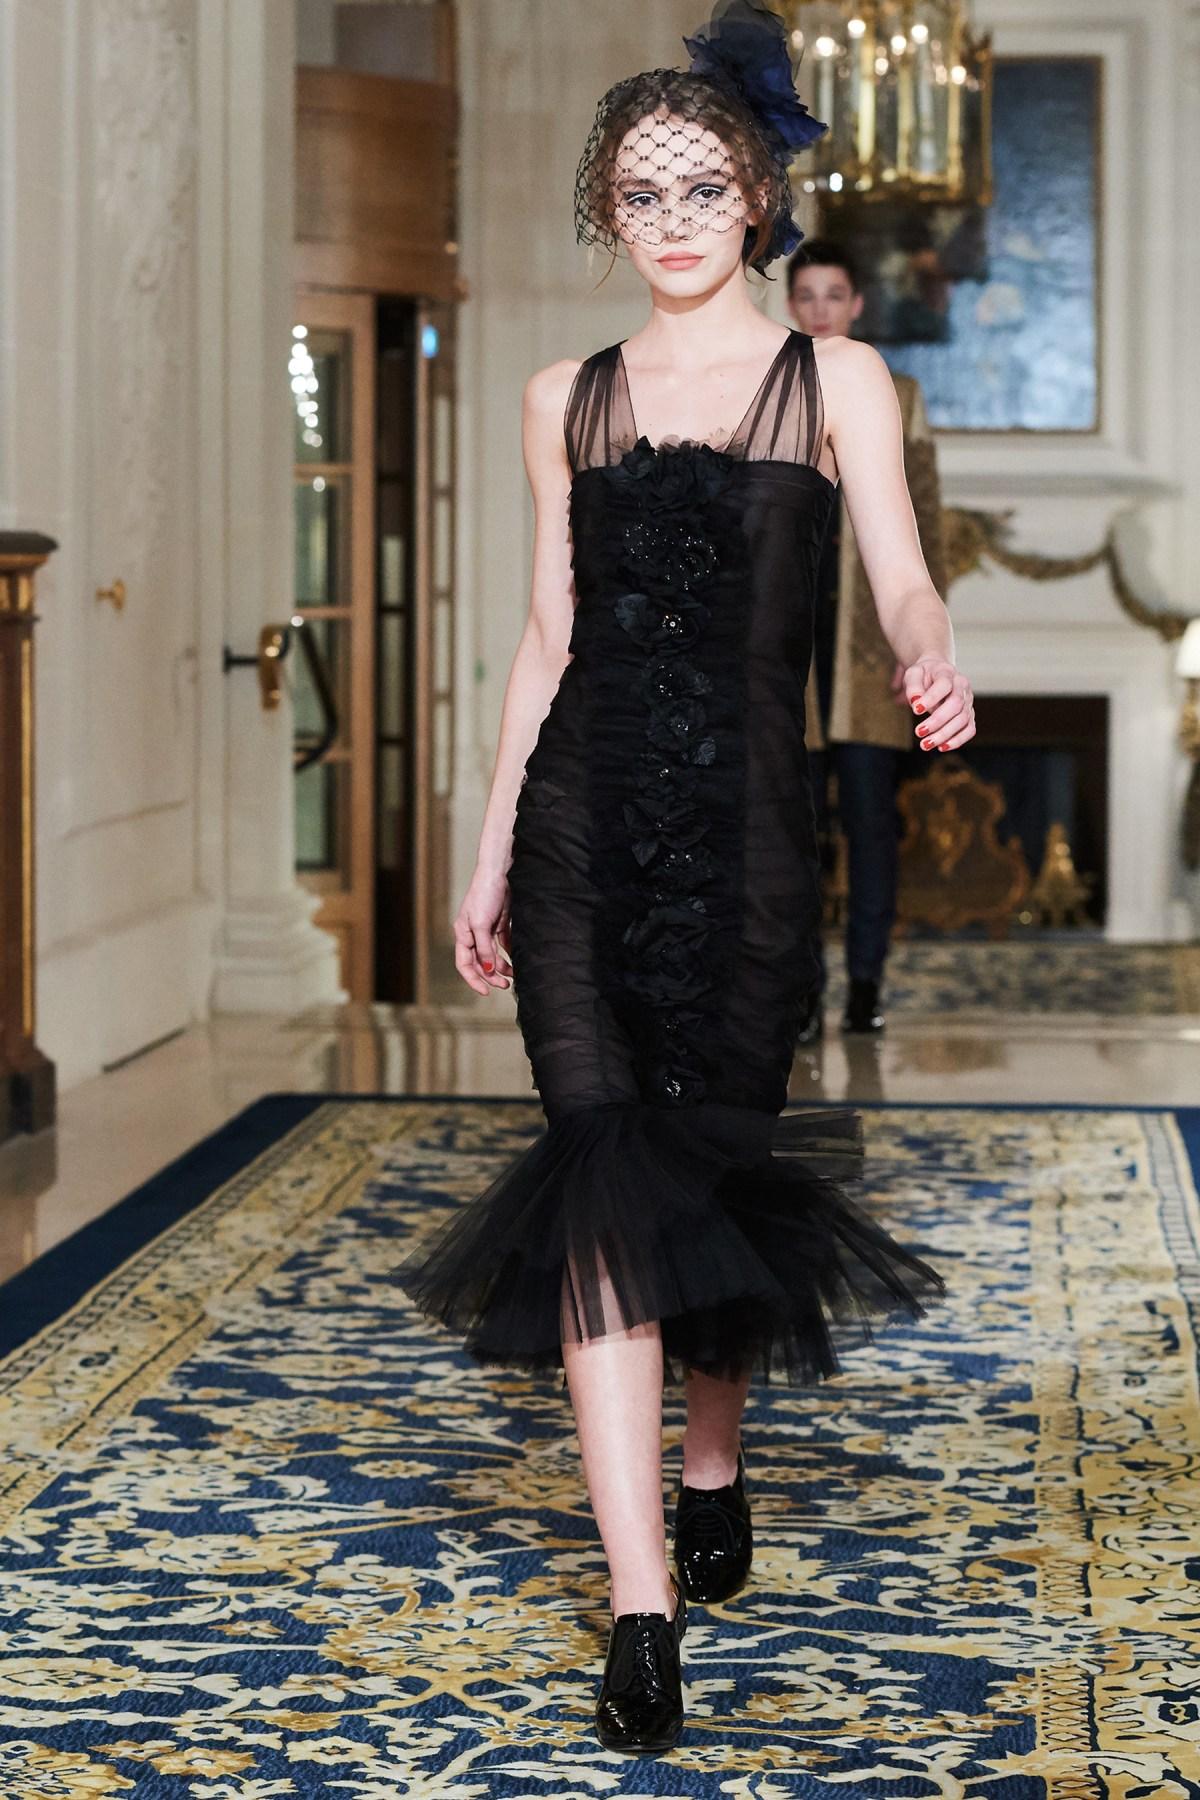 Chanel Metiers d'Art PO FW16 0158